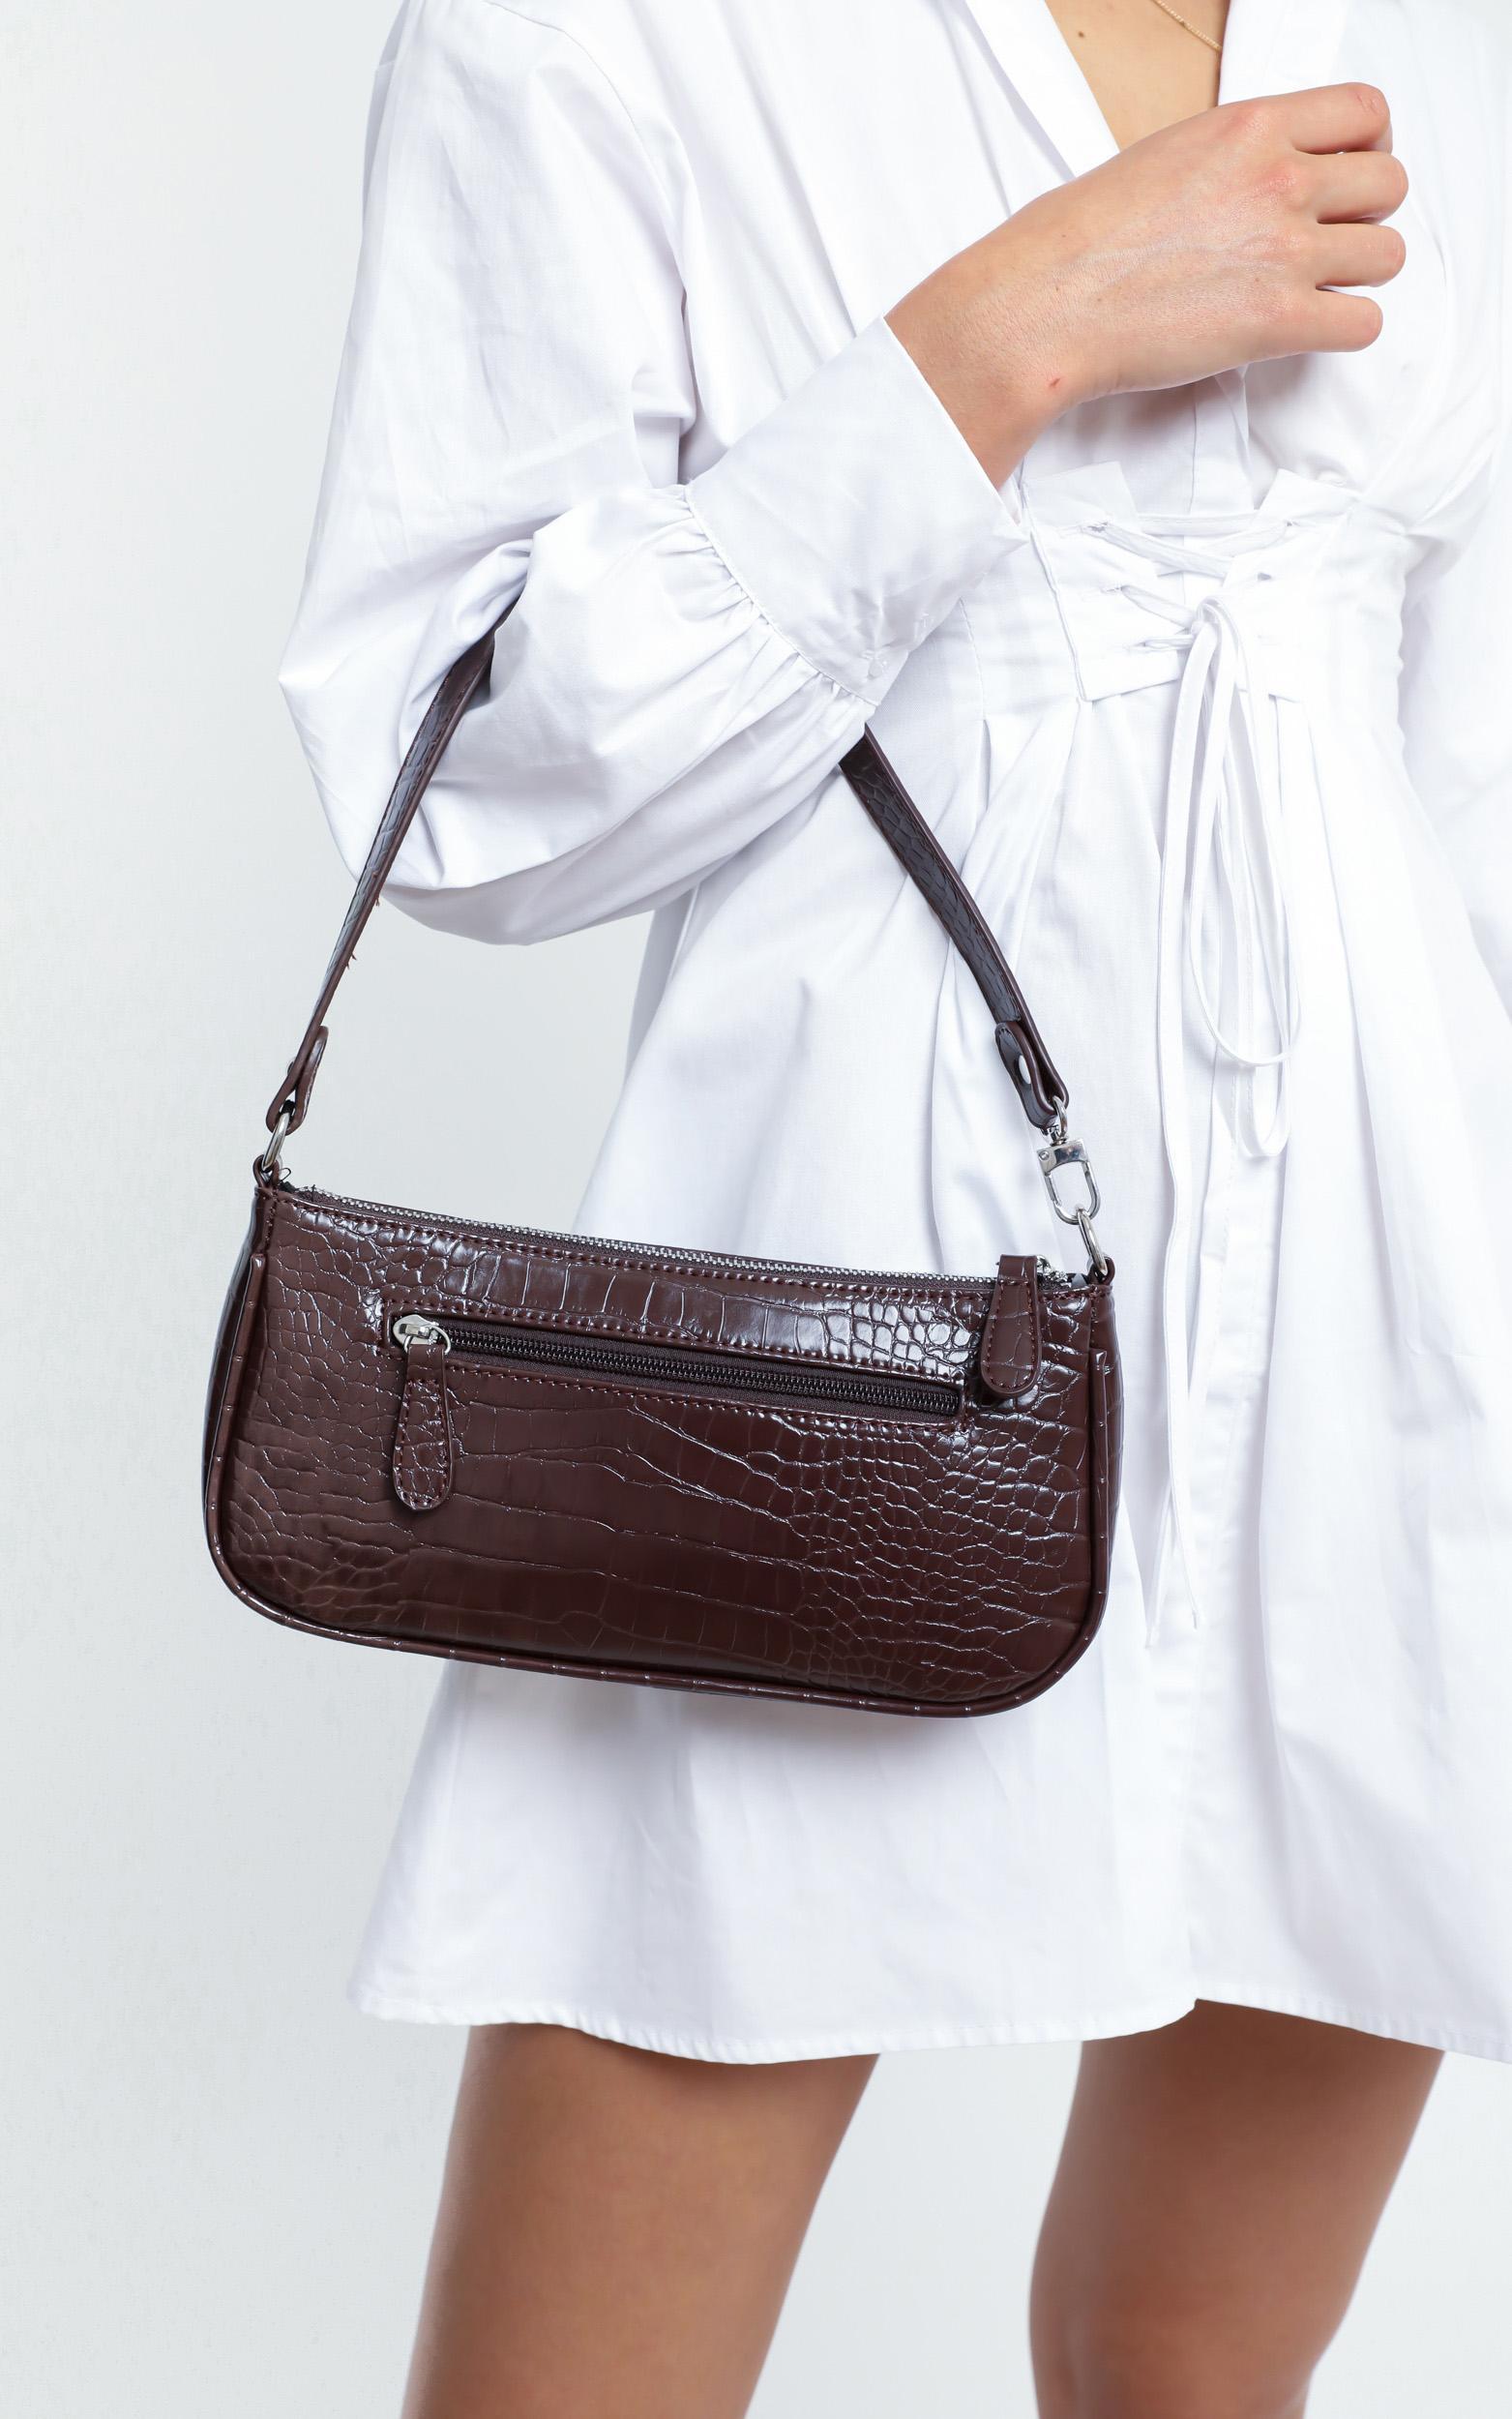 Save My Love Bag In Chocolate Croc, Brown, hi-res image number null